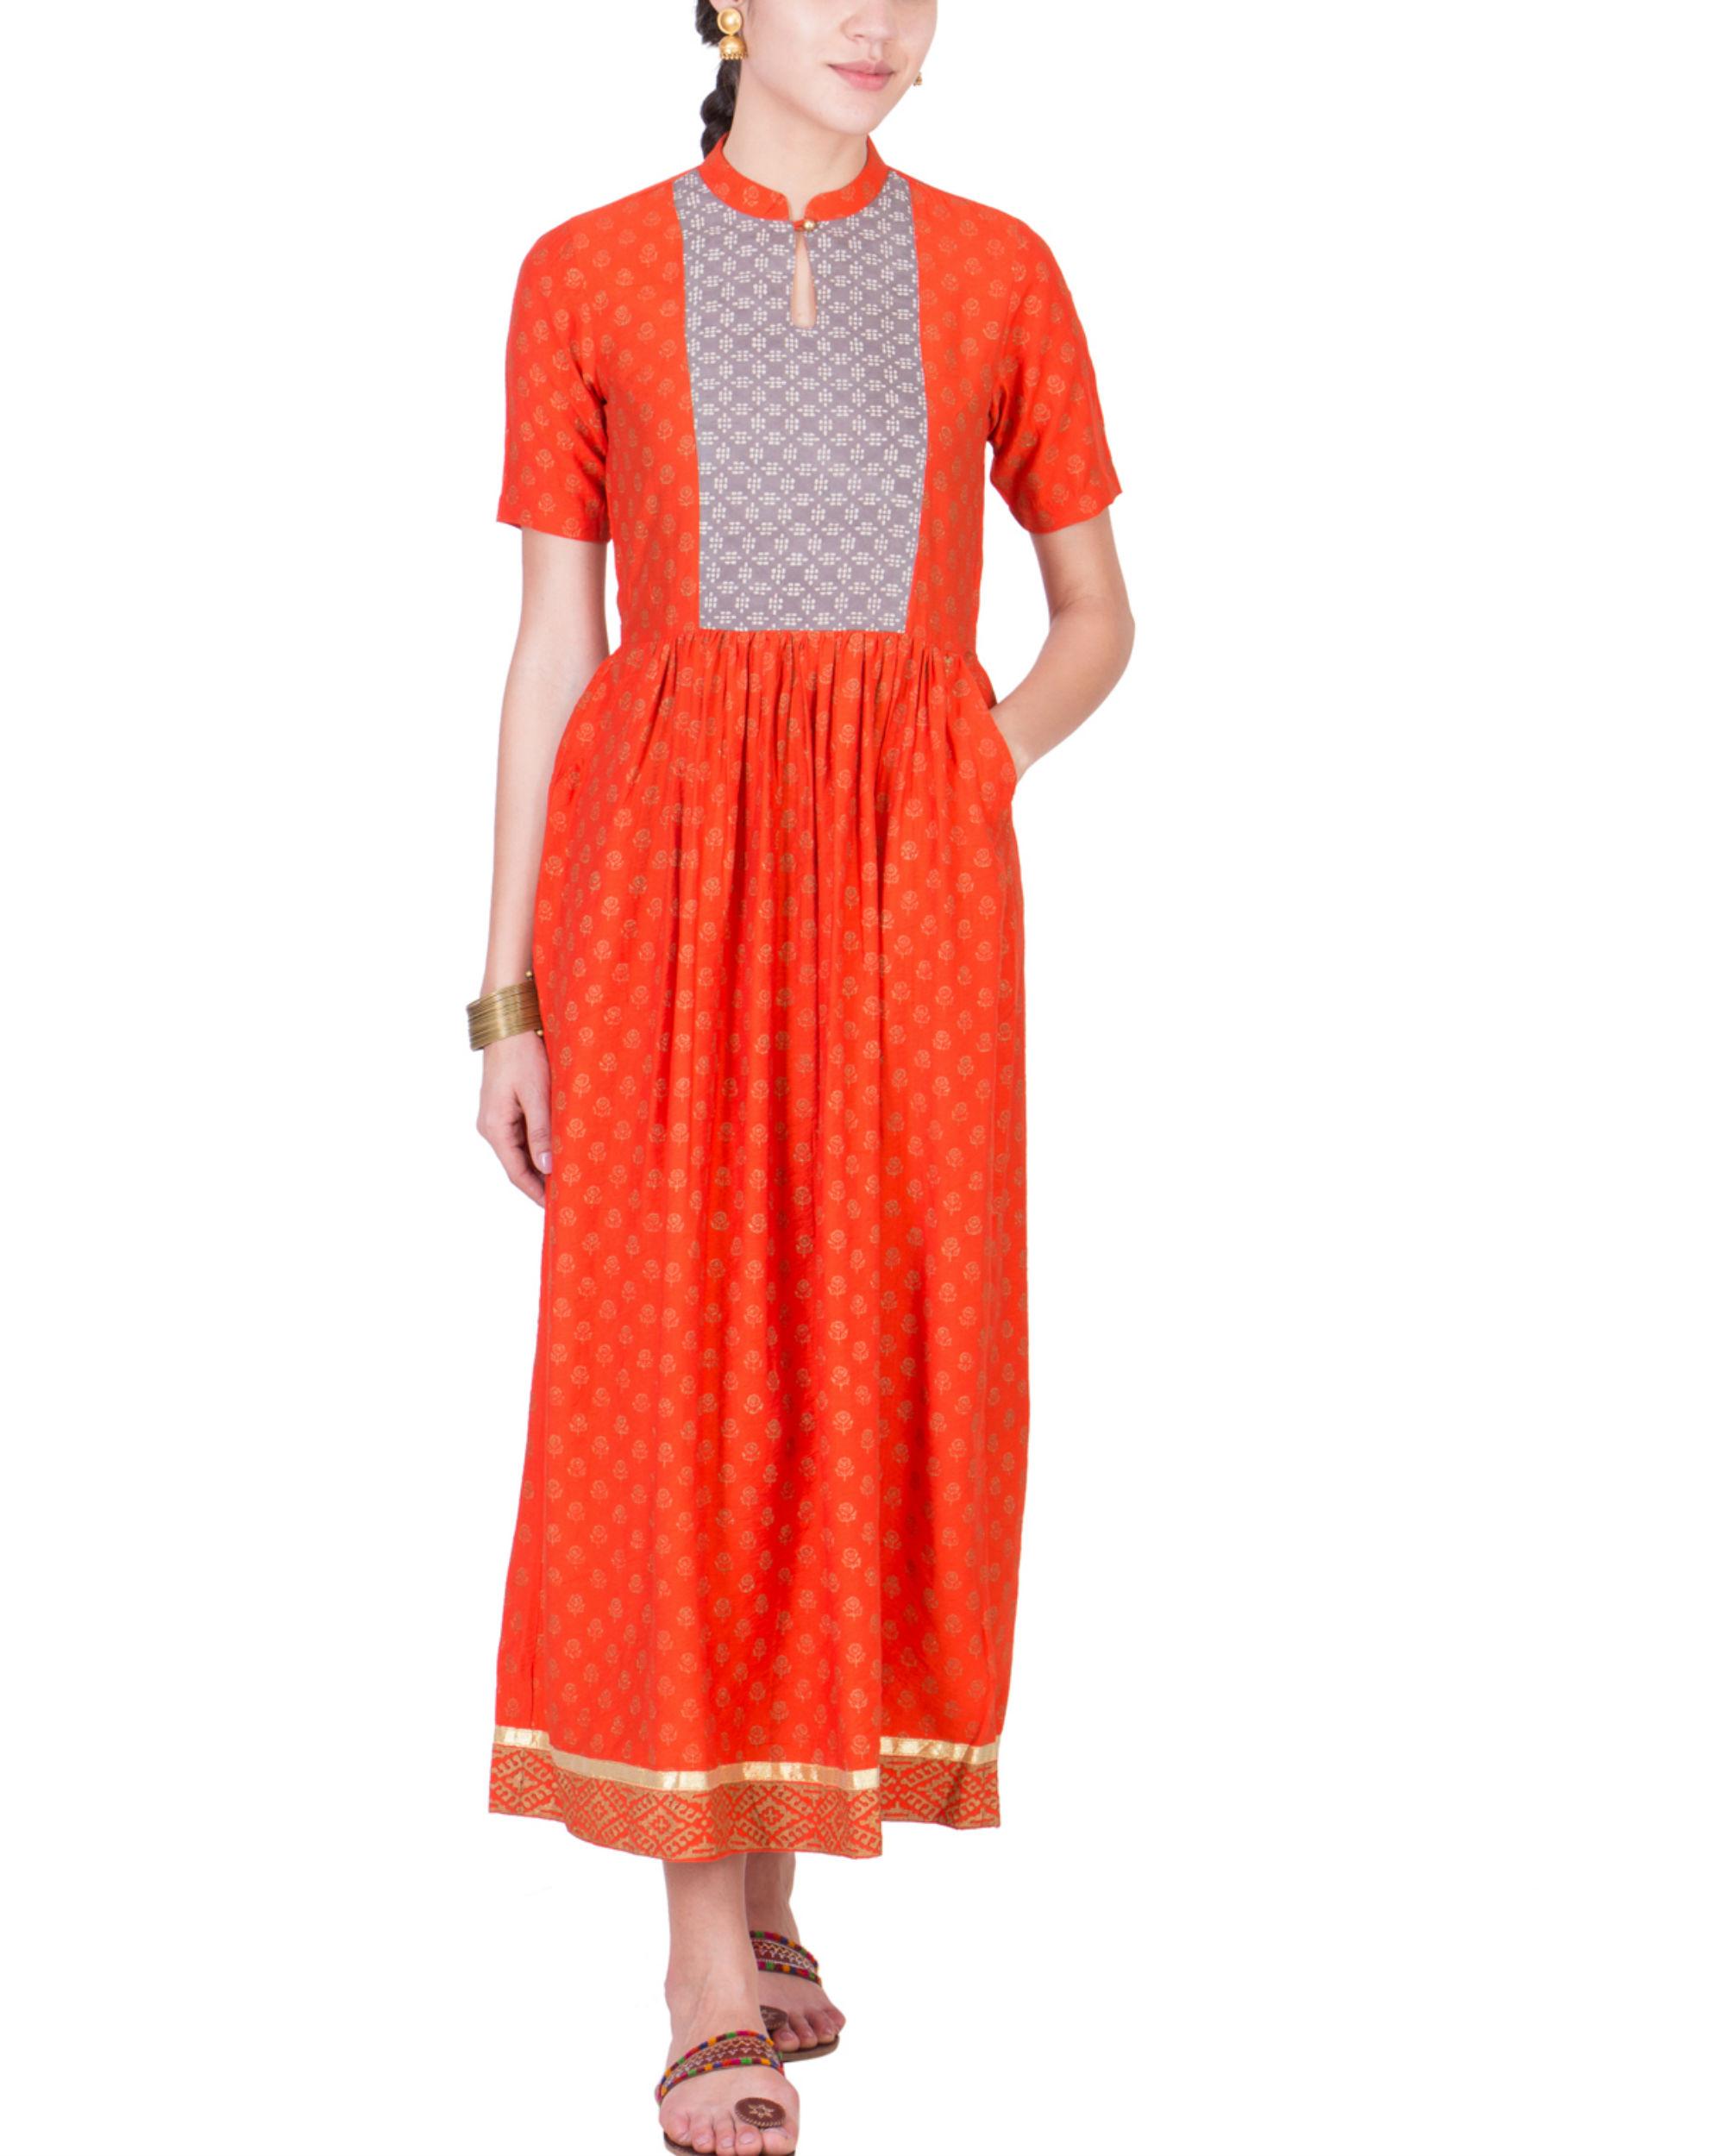 Orange yoke dress